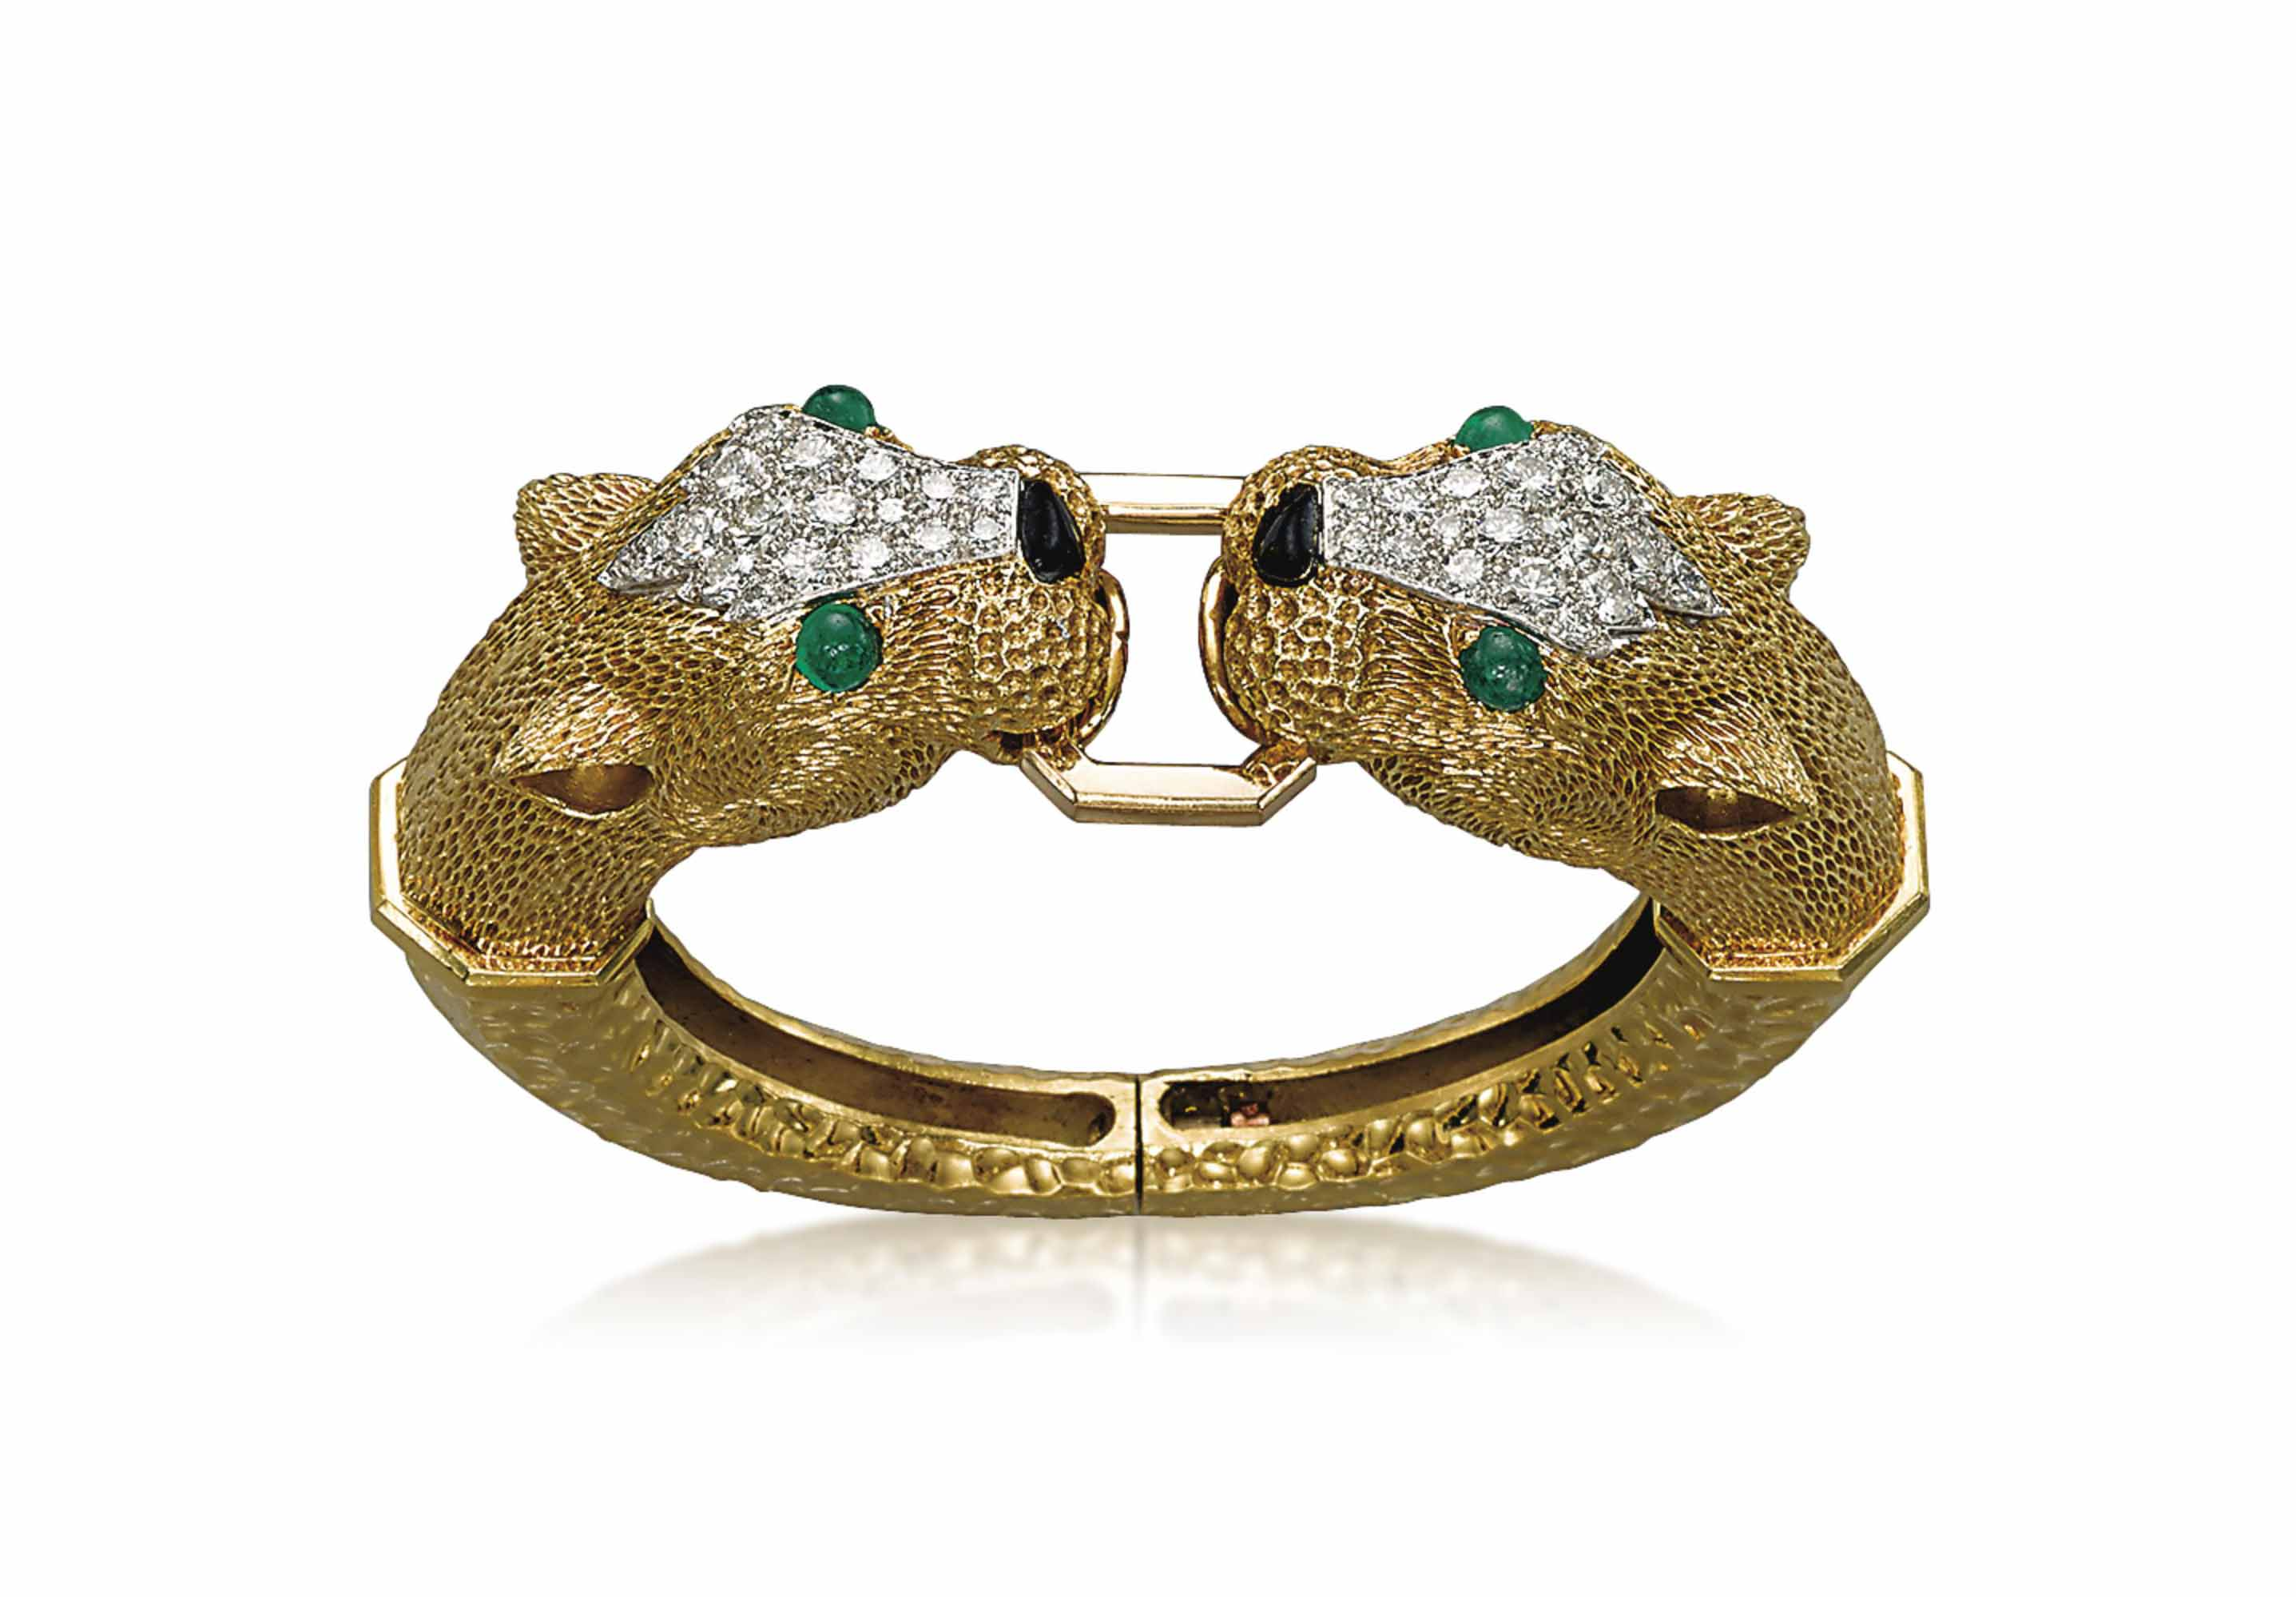 A GOLD, DIAMOND AND EMERALD BANGLE, BY KUTCHINSKY